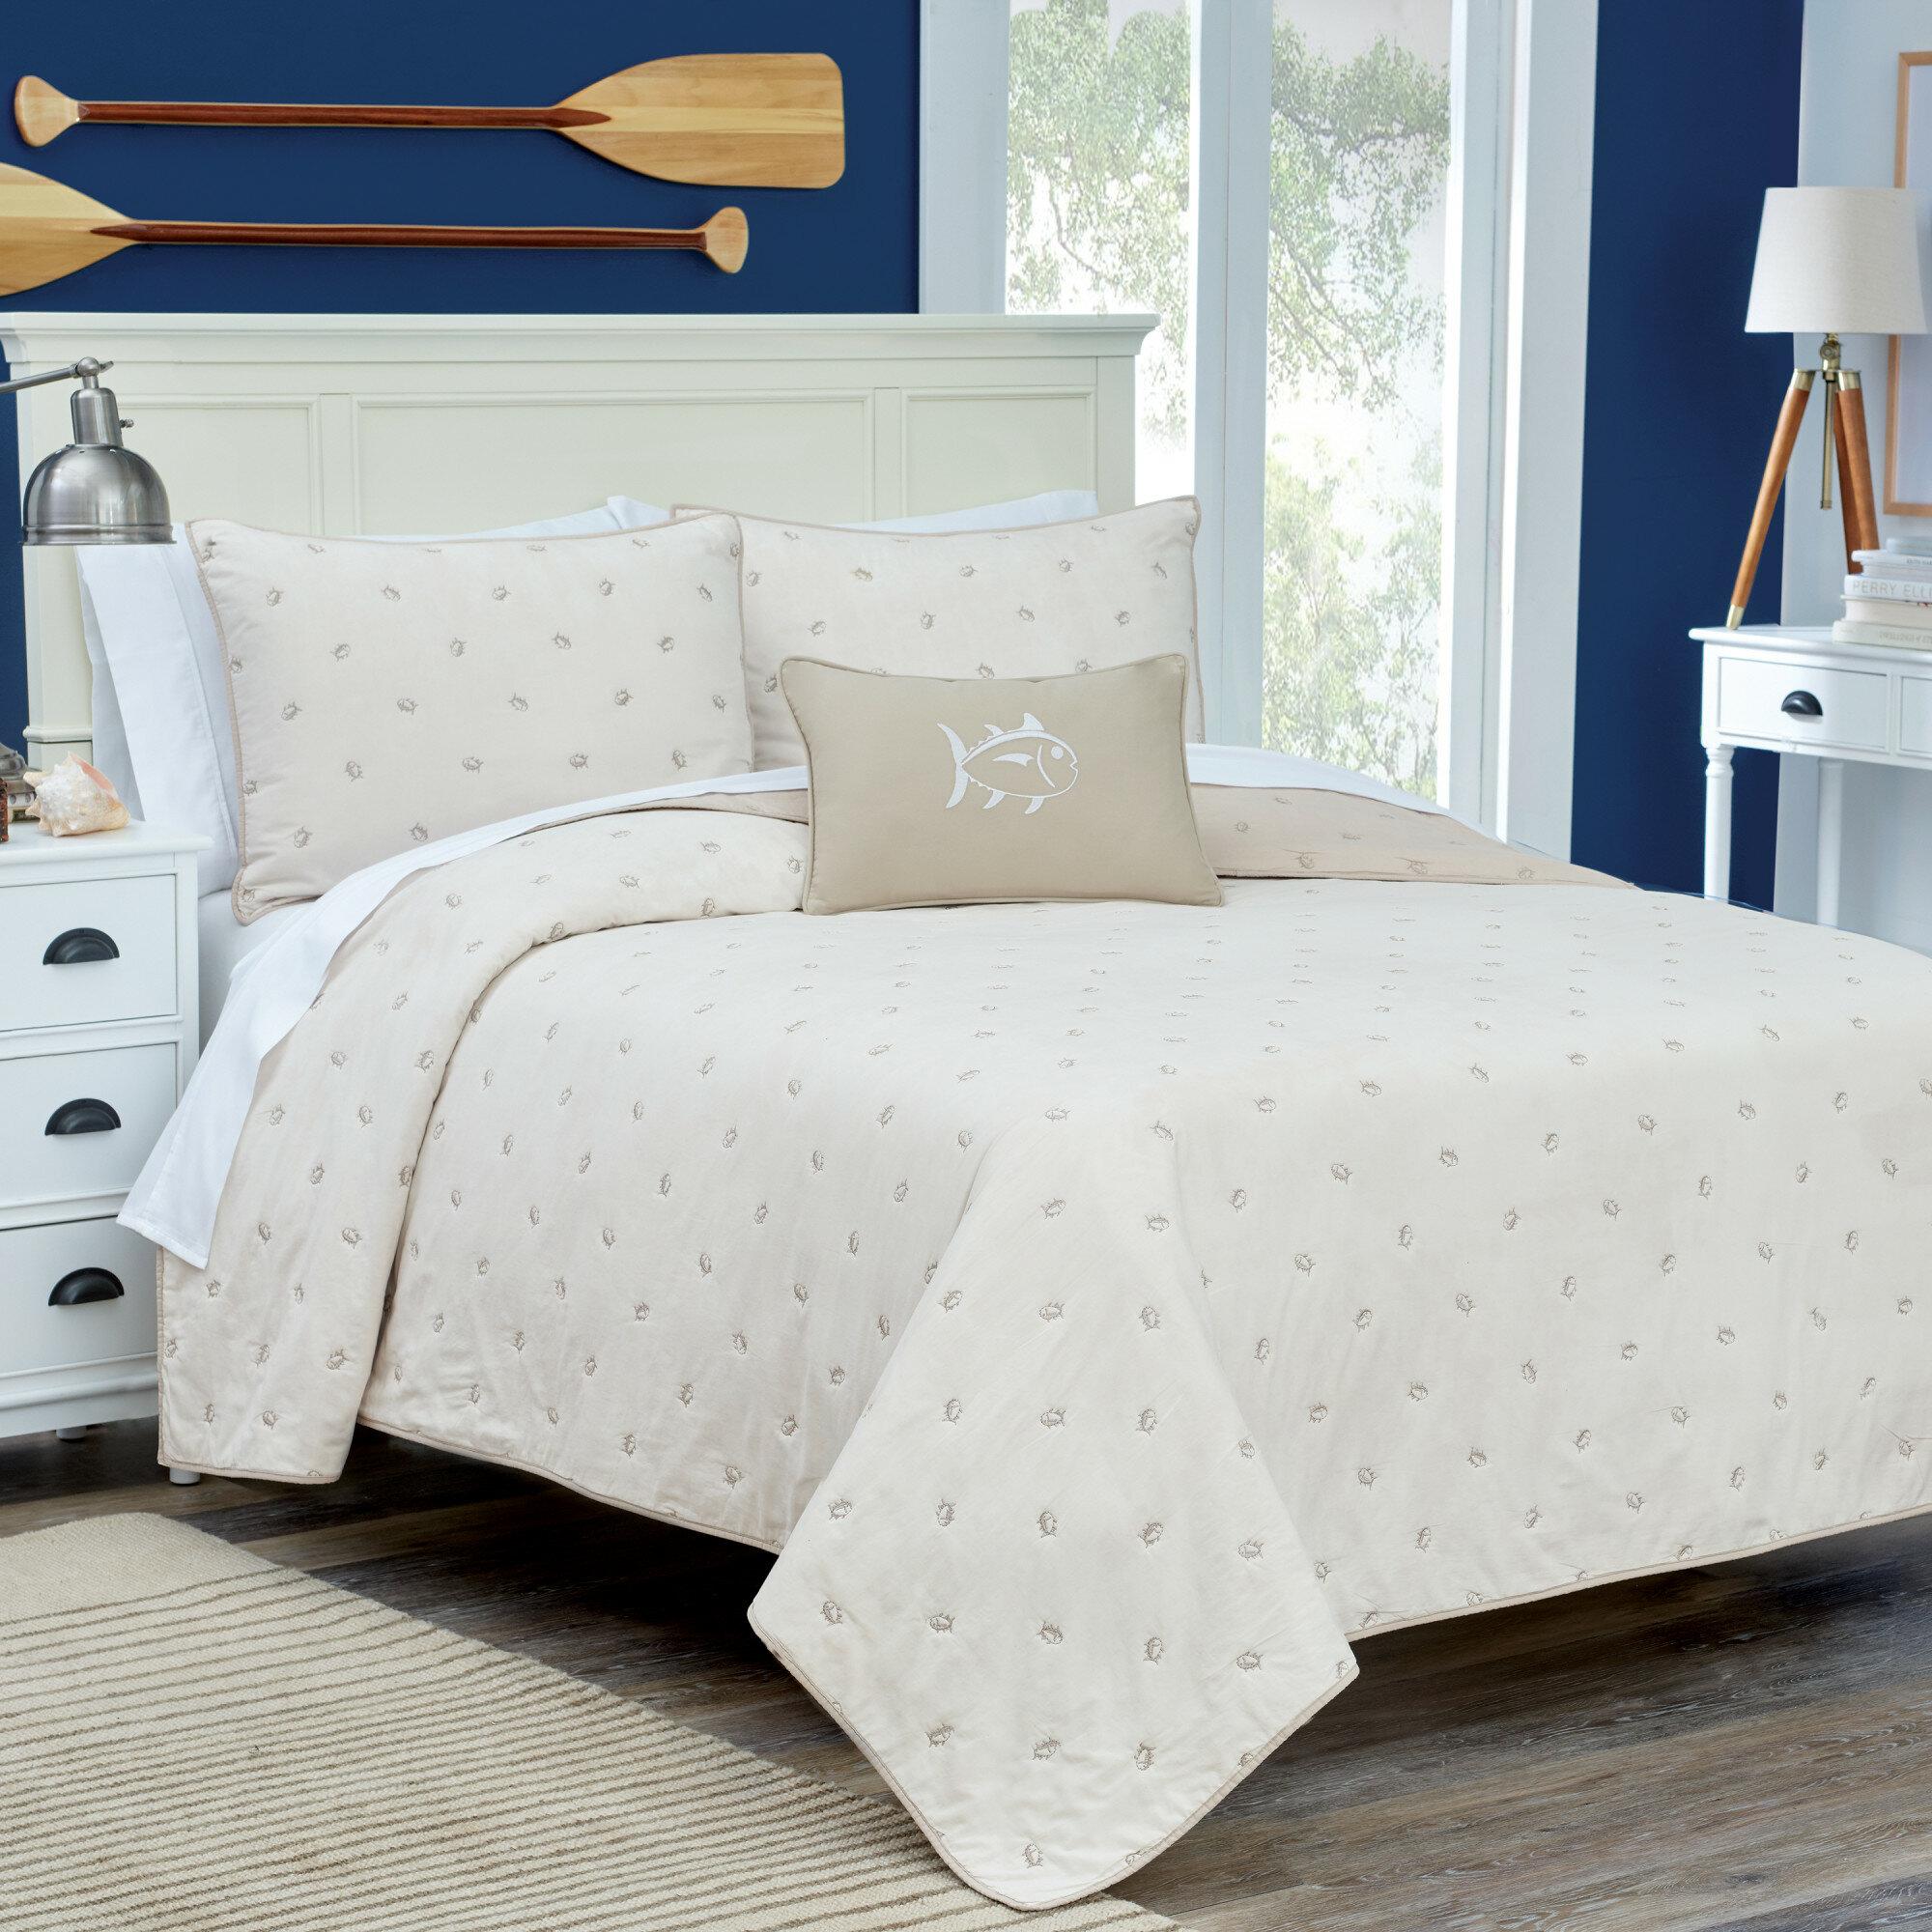 nicole pillowcase miller laptop comforter bedding of southern outlet minecraft villanova online gray full size case tide yankee